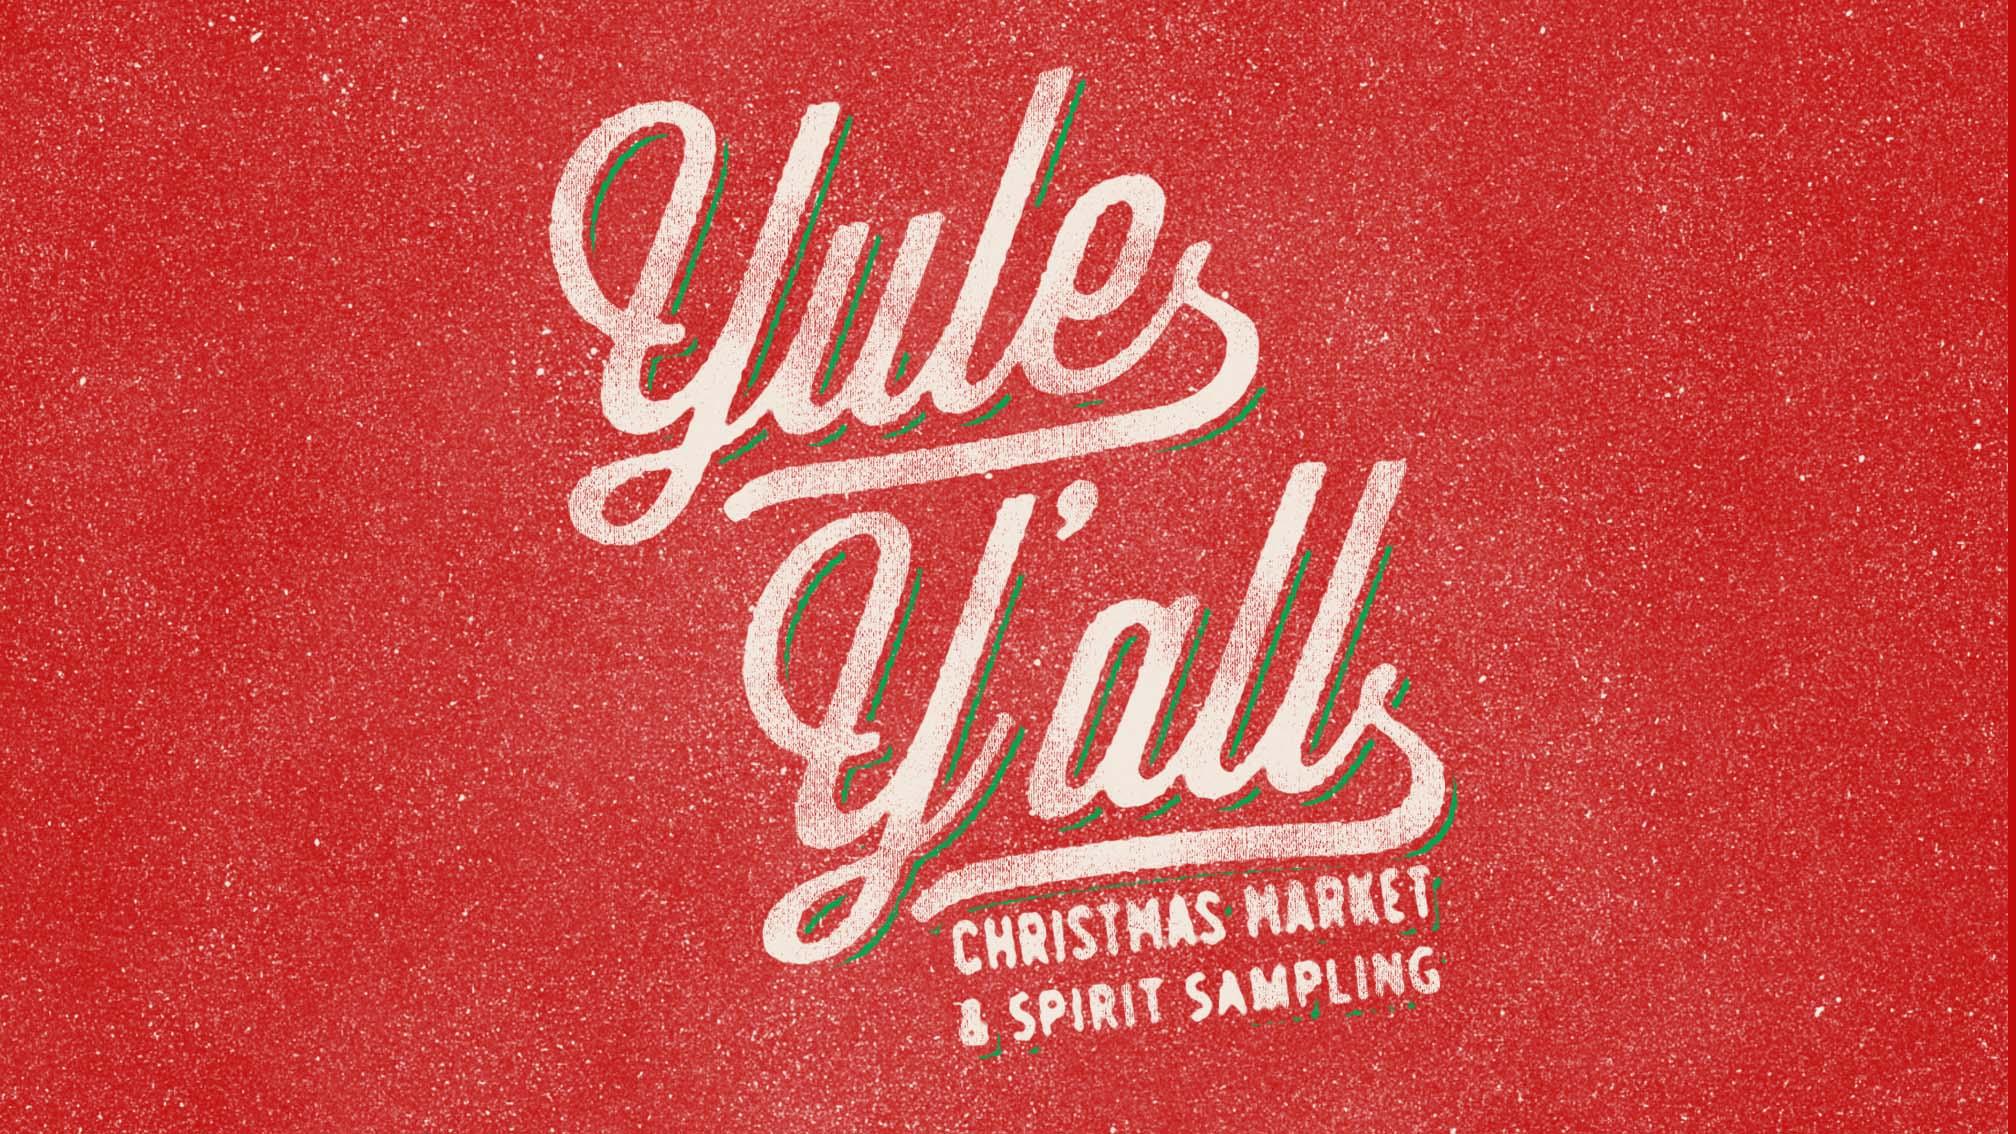 Yule Y'all: Christmas Market and Spirit Sampling